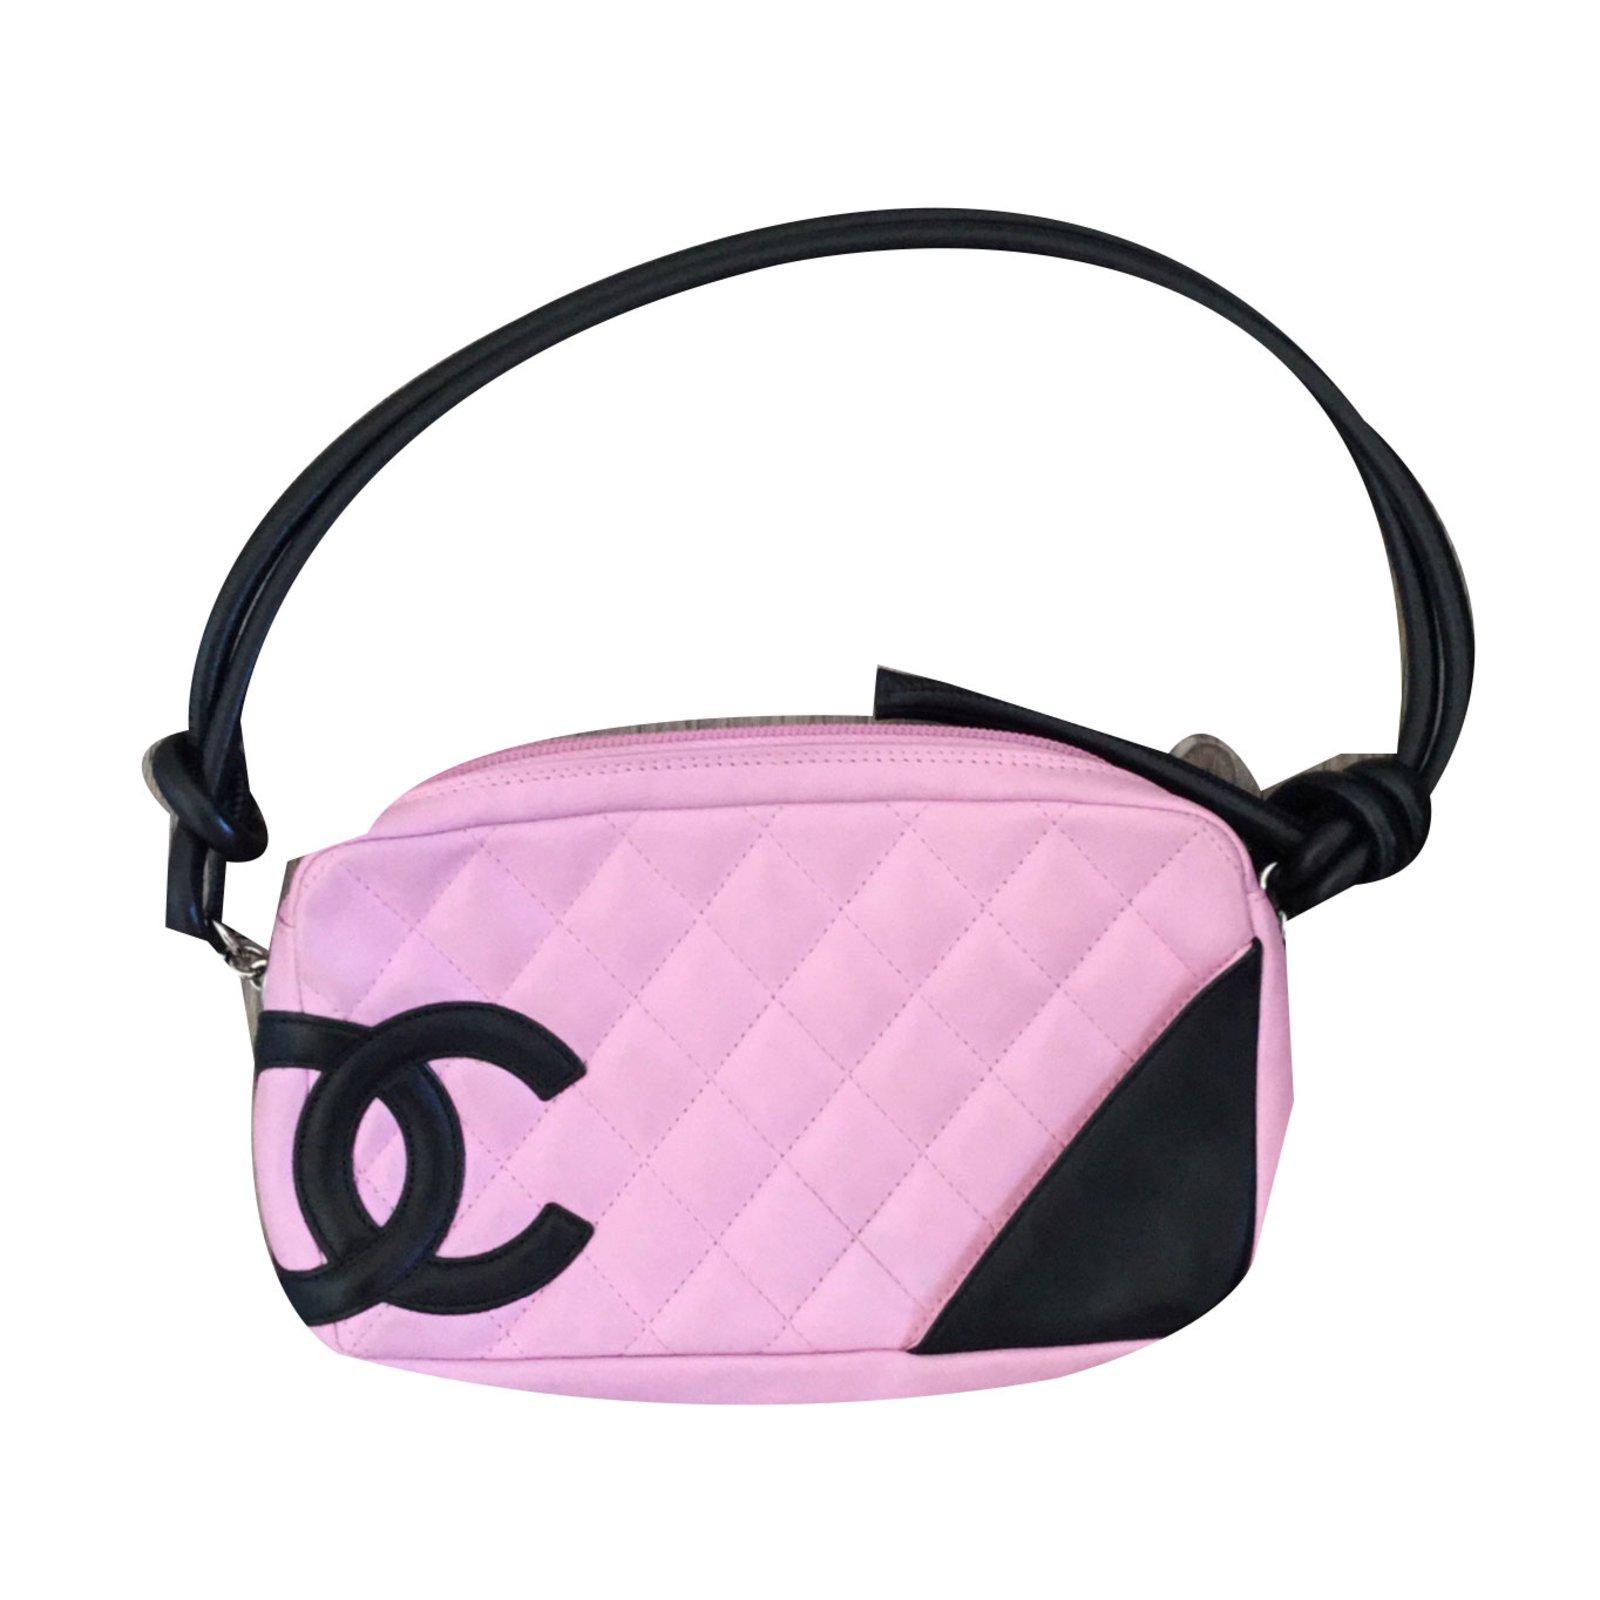 c3e7e16513d Sacs à main Chanel Cambon Cuir Rose ref.30652 - Joli Closet